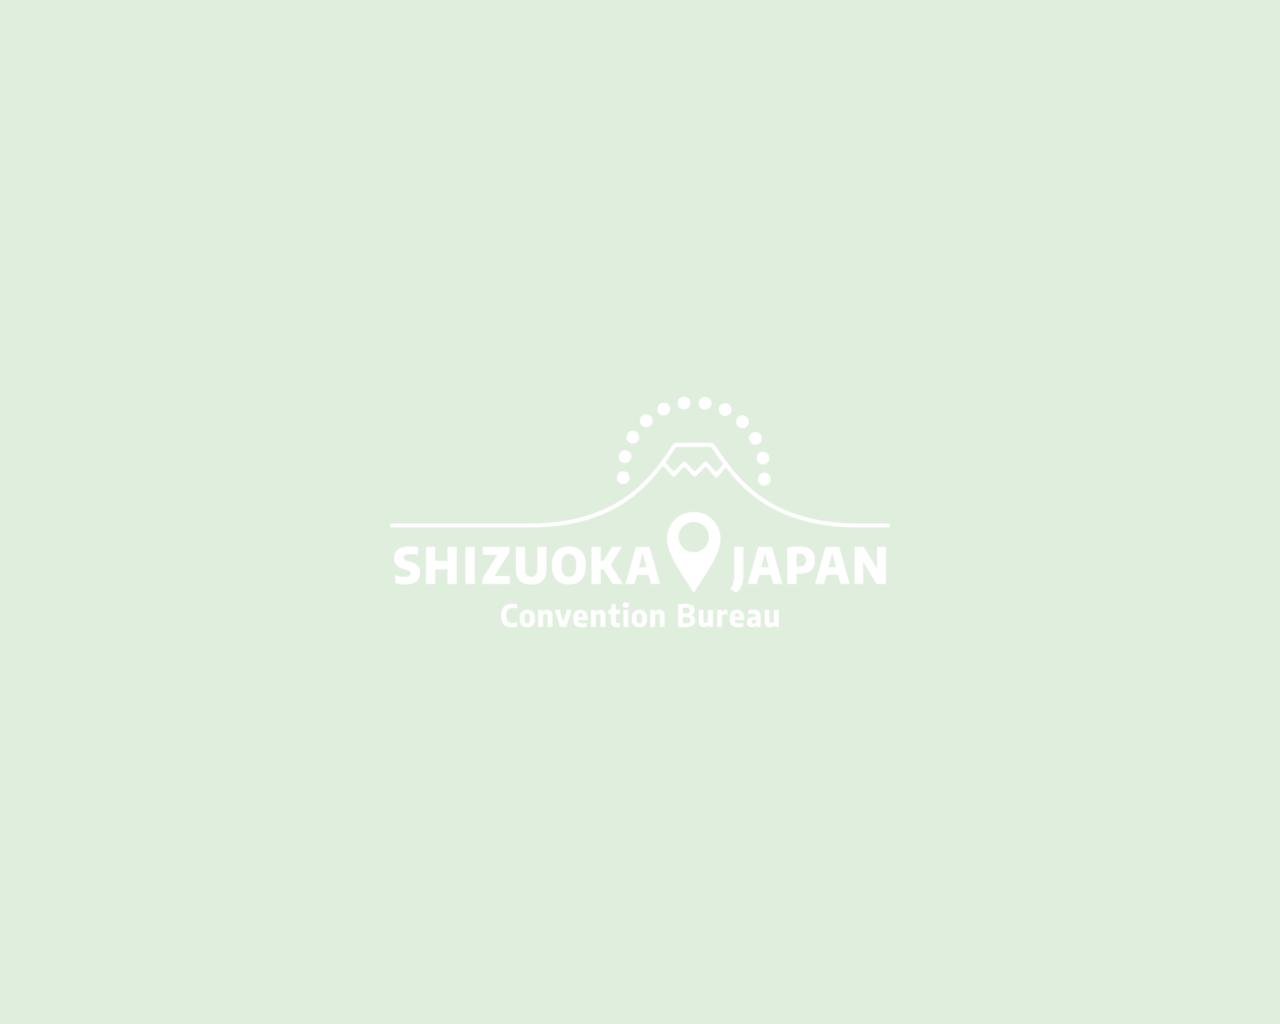 https://www.shizuoka-cb.com/wp-content/uploads/2021/03/photoH-empty-11-1280x1024.png